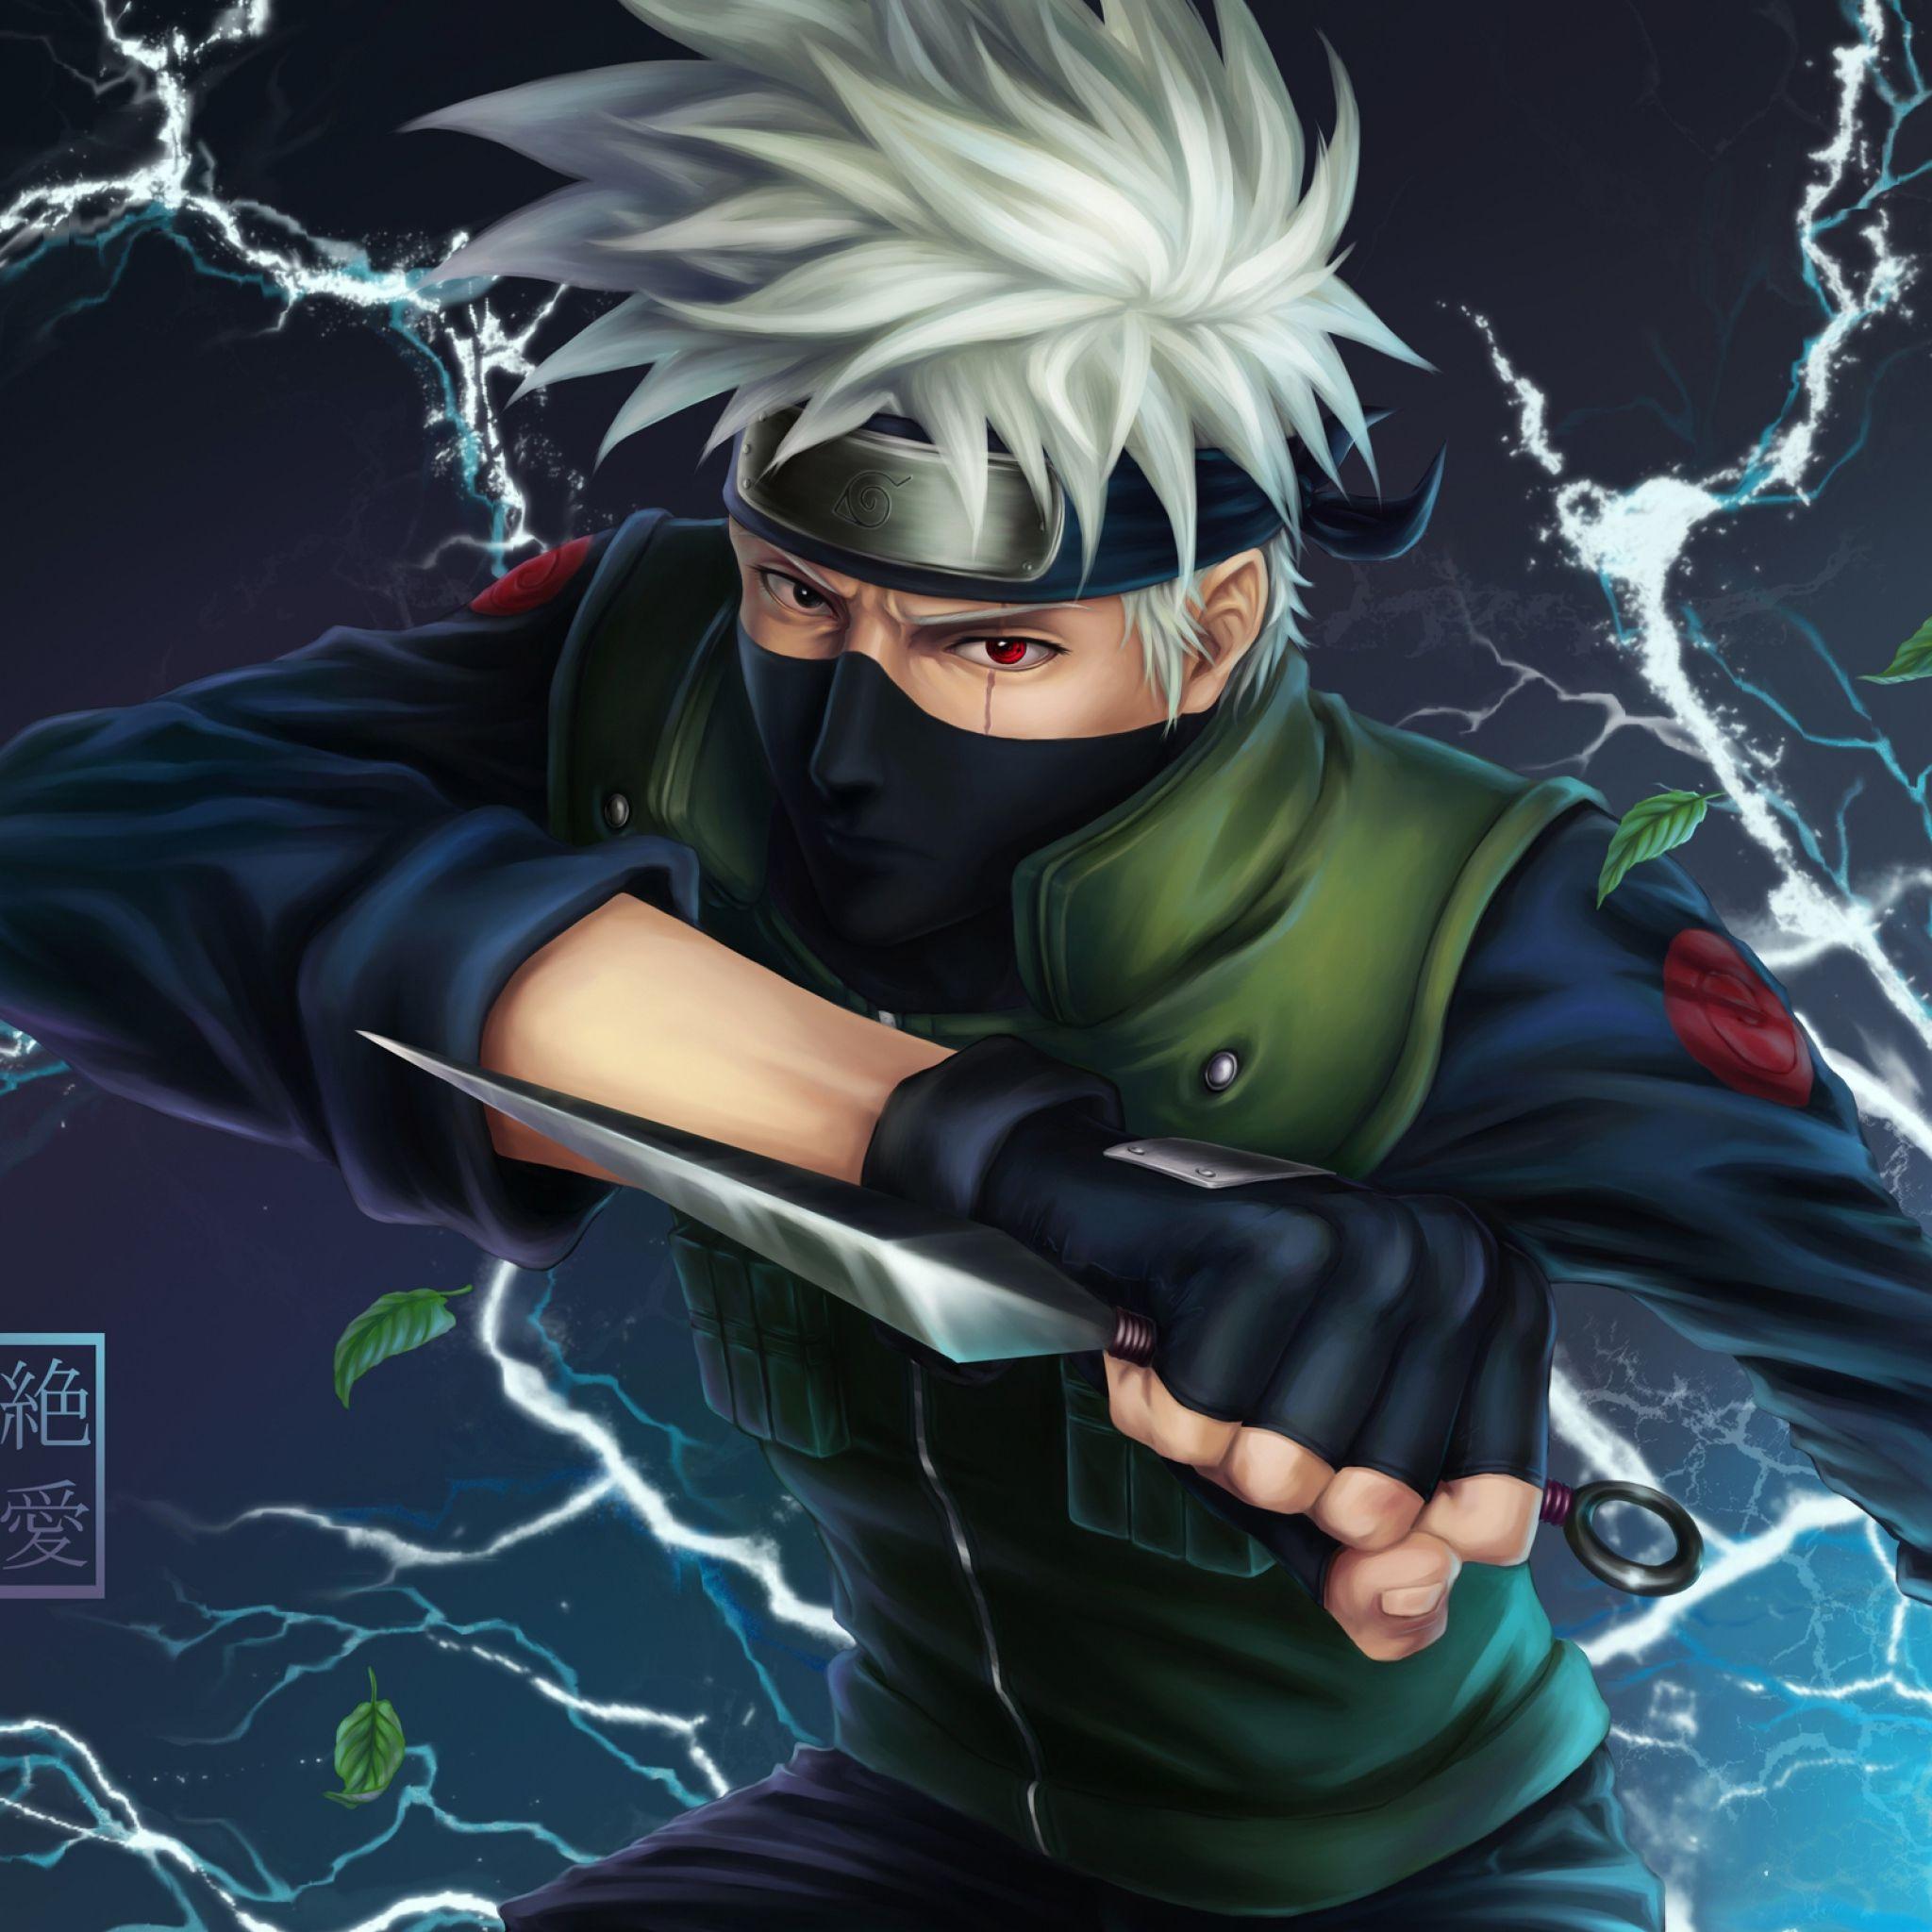 Most Inspiring Wallpaper Naruto Ipad - 6fc857ff06ff255987d0ee8f6c0d94a4  Pictures_578365.jpg